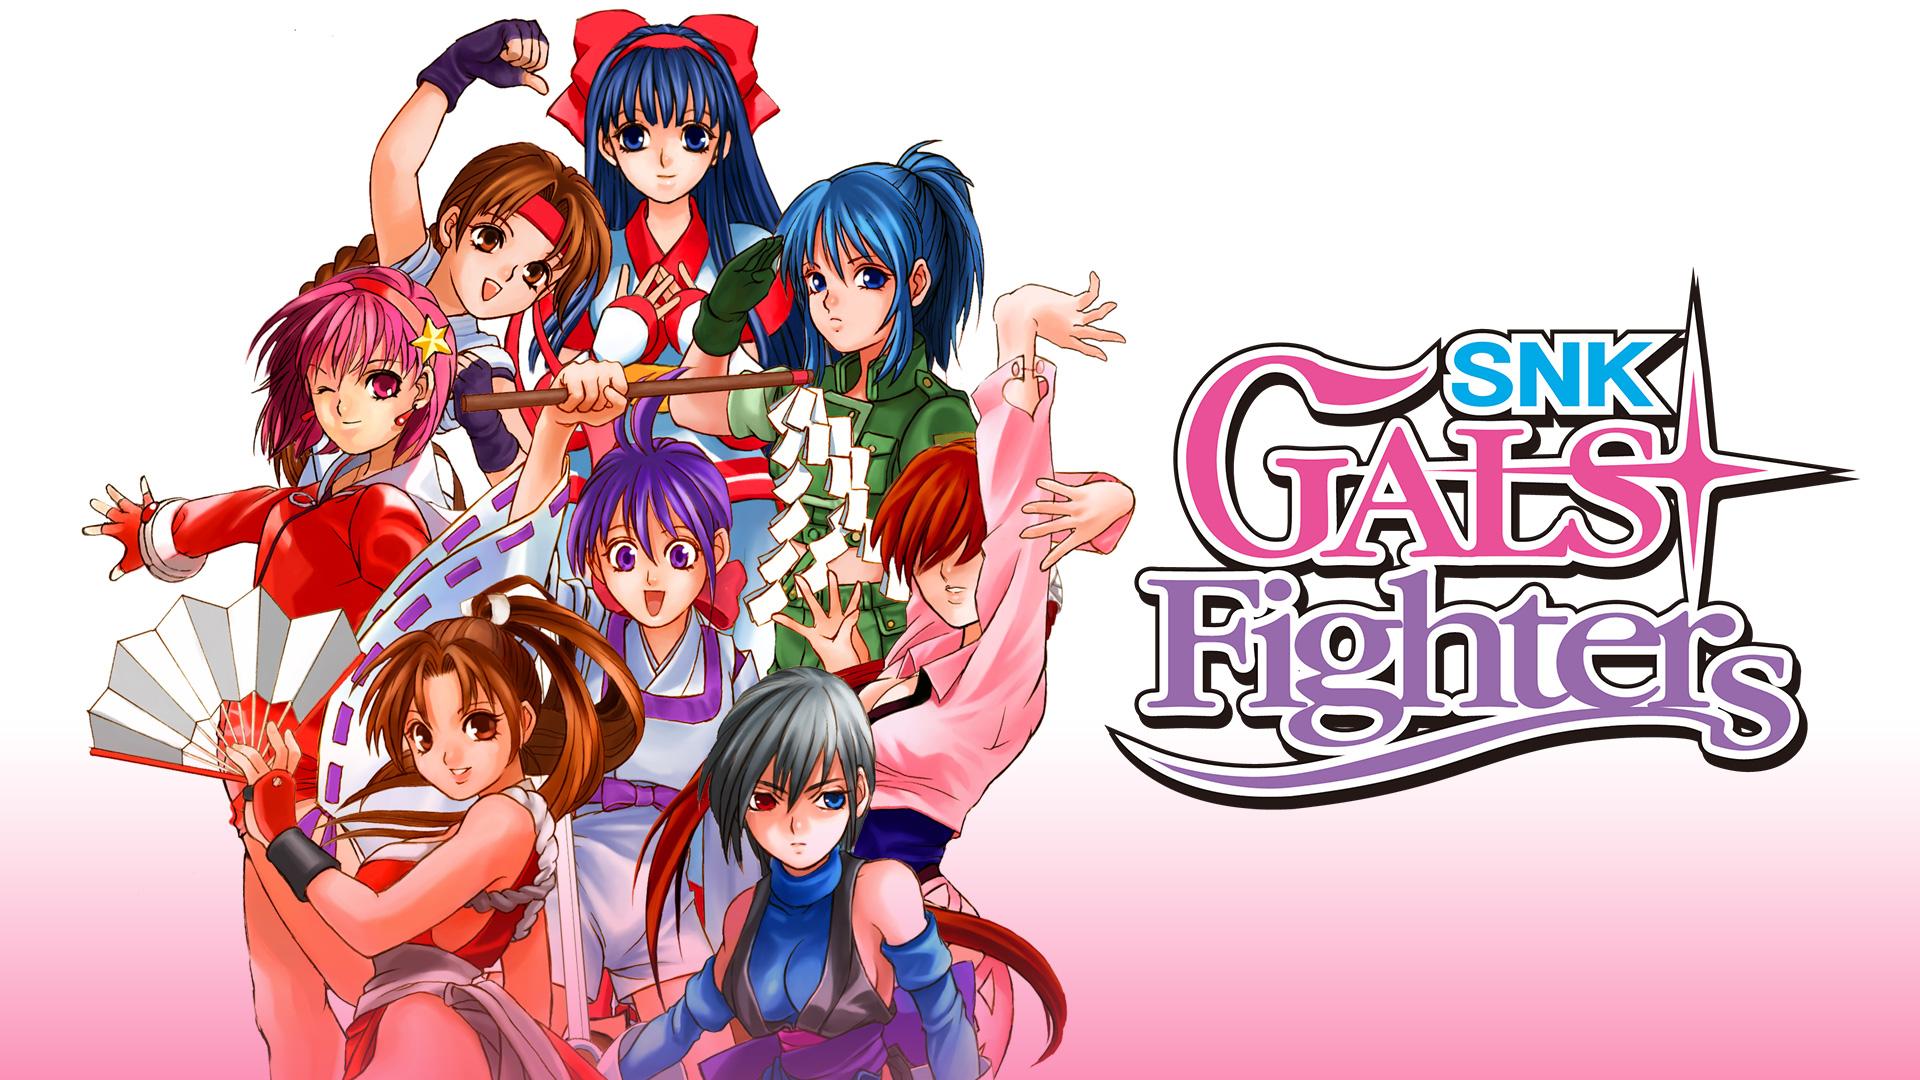 На Nintendo Switch состоялся релиз SNK Gals' Fighters